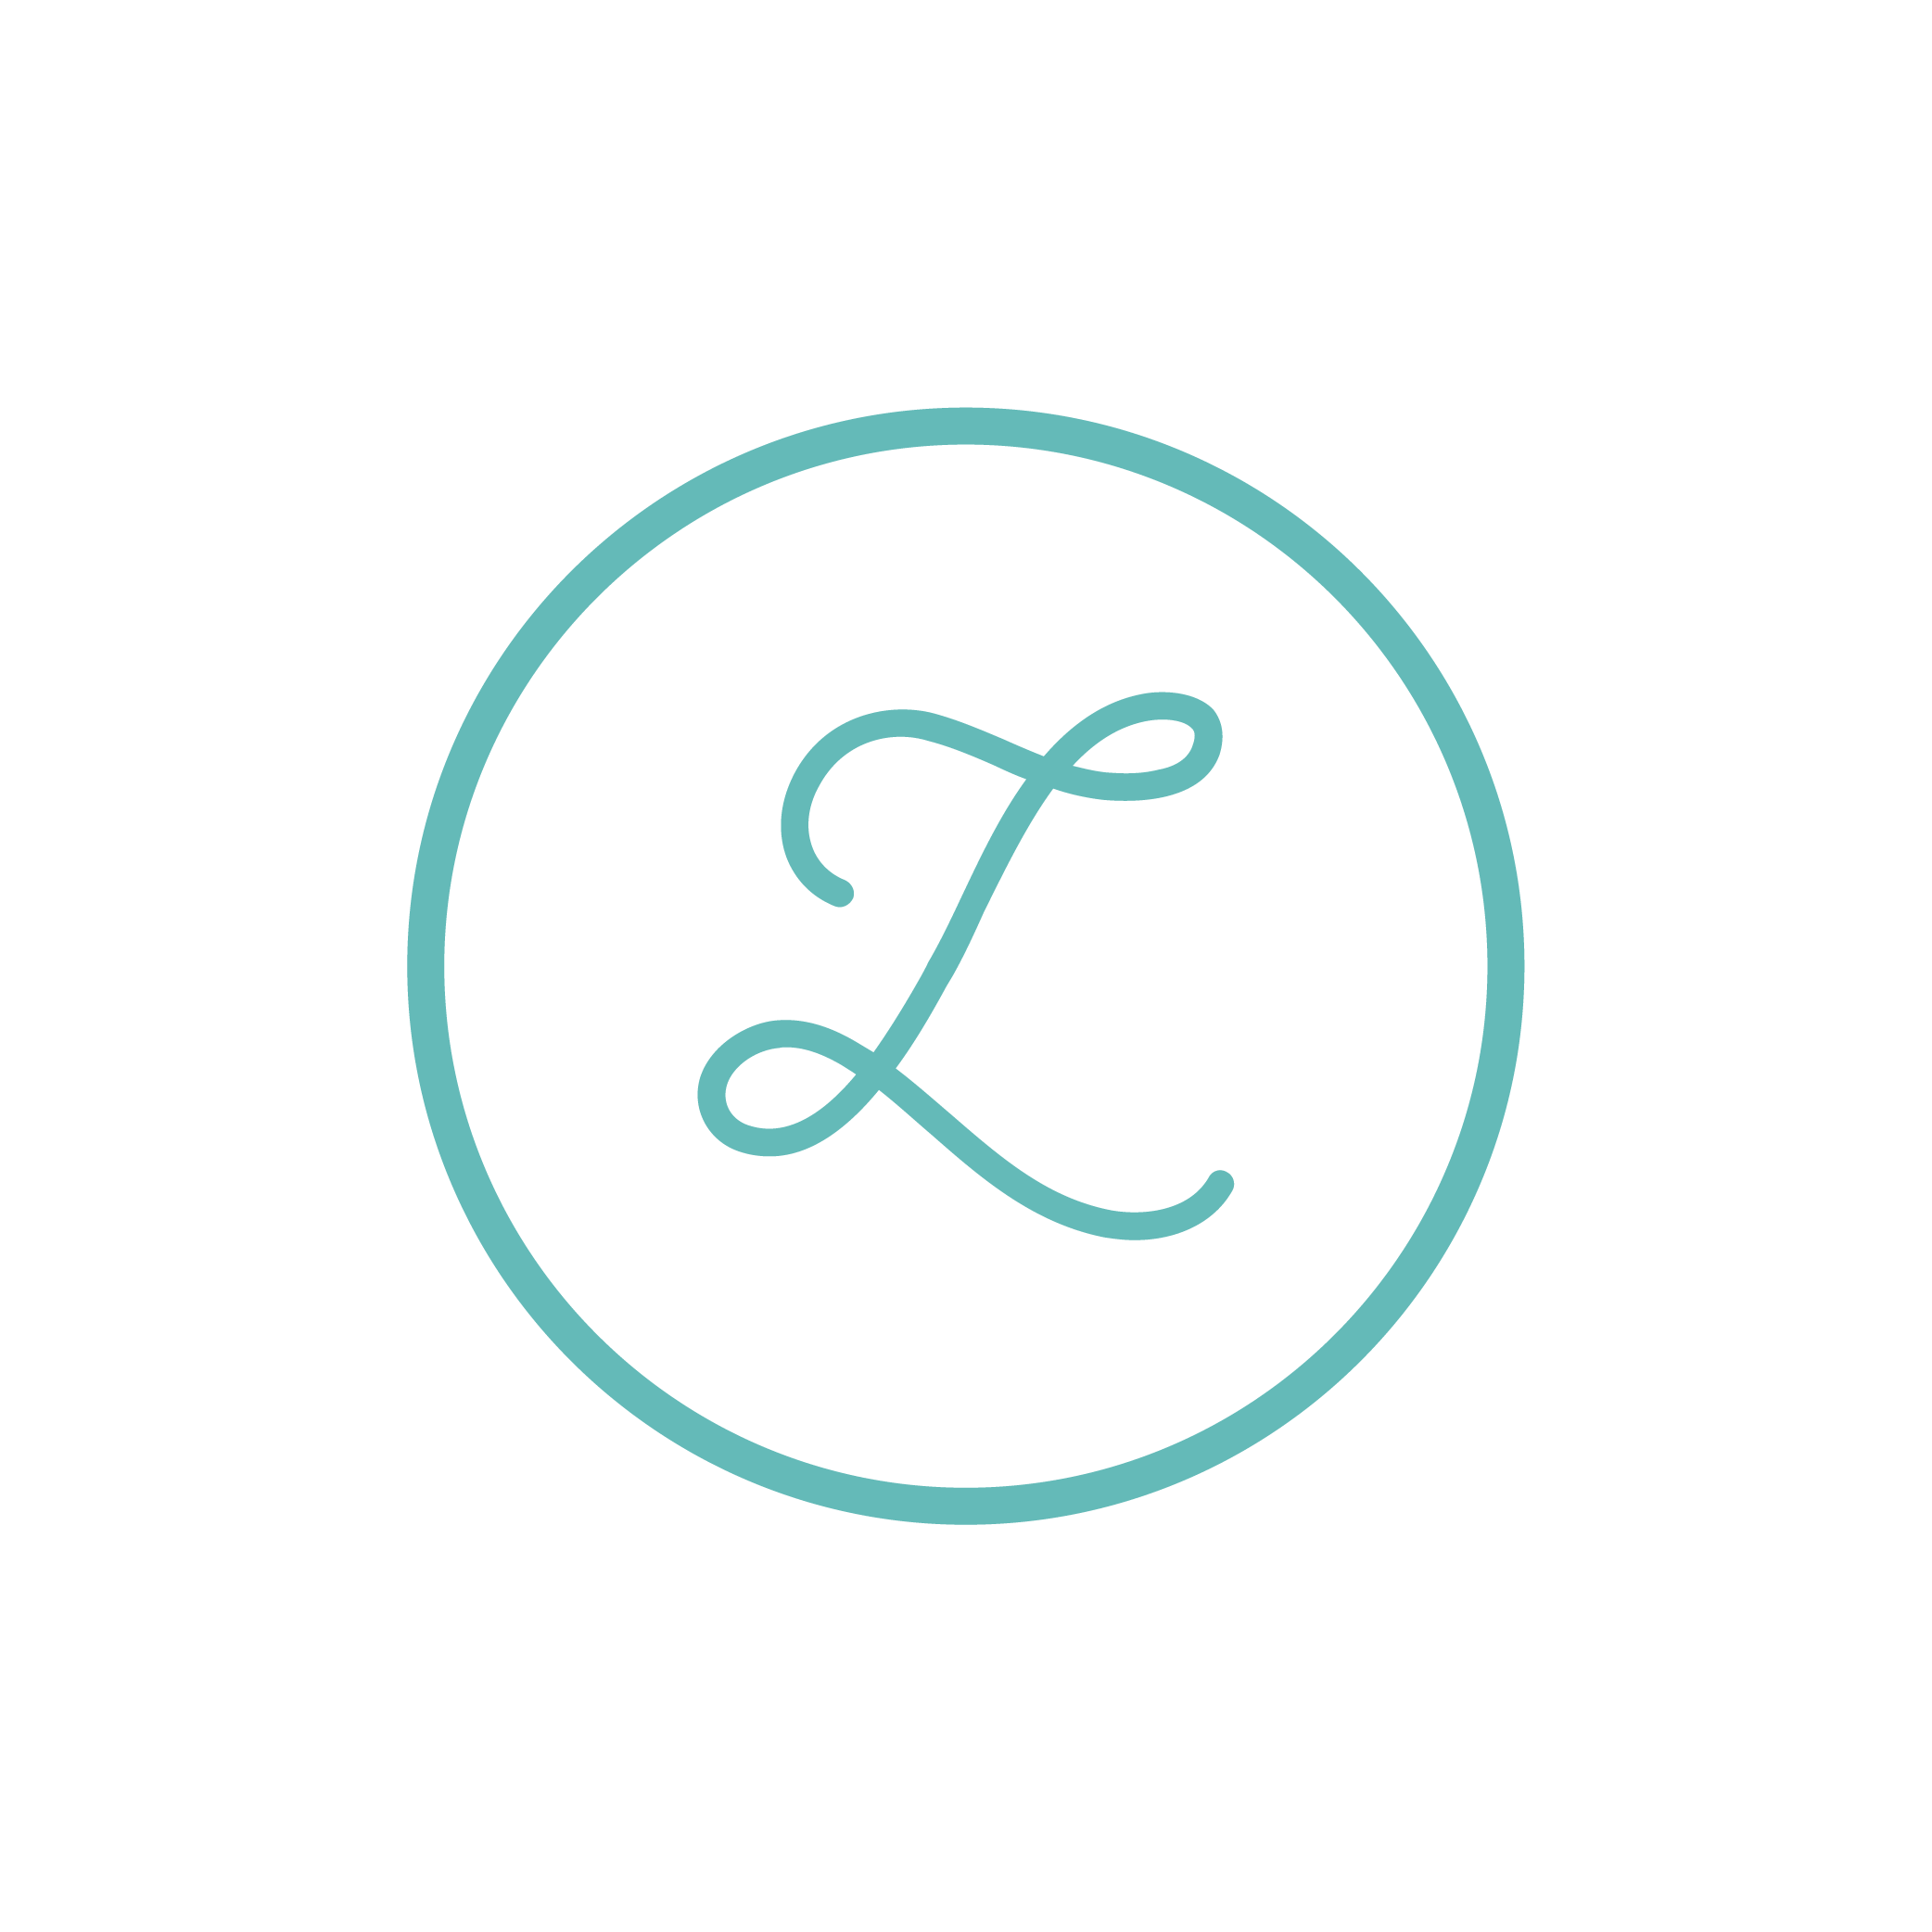 LEX.LIVE.LUXE  | Brand Identity